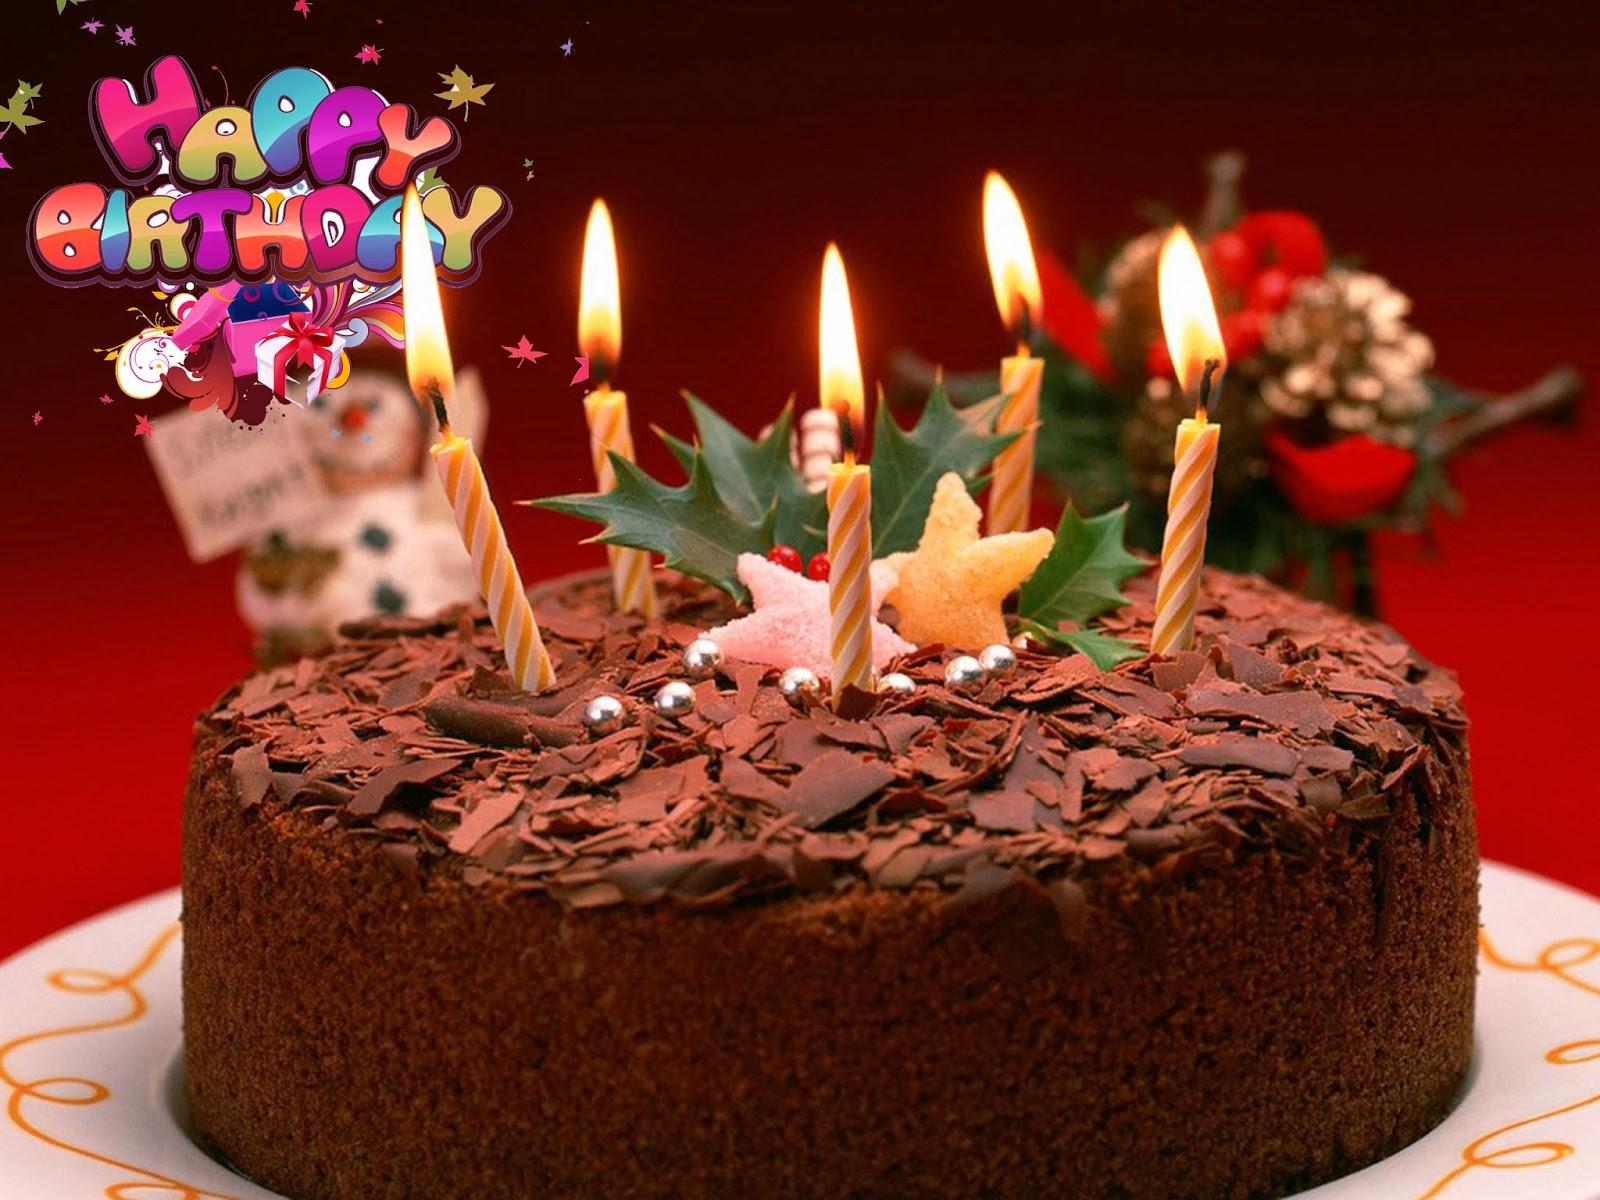 Happy-Birthday-Chocolate-Cake-Image-HD-Wide